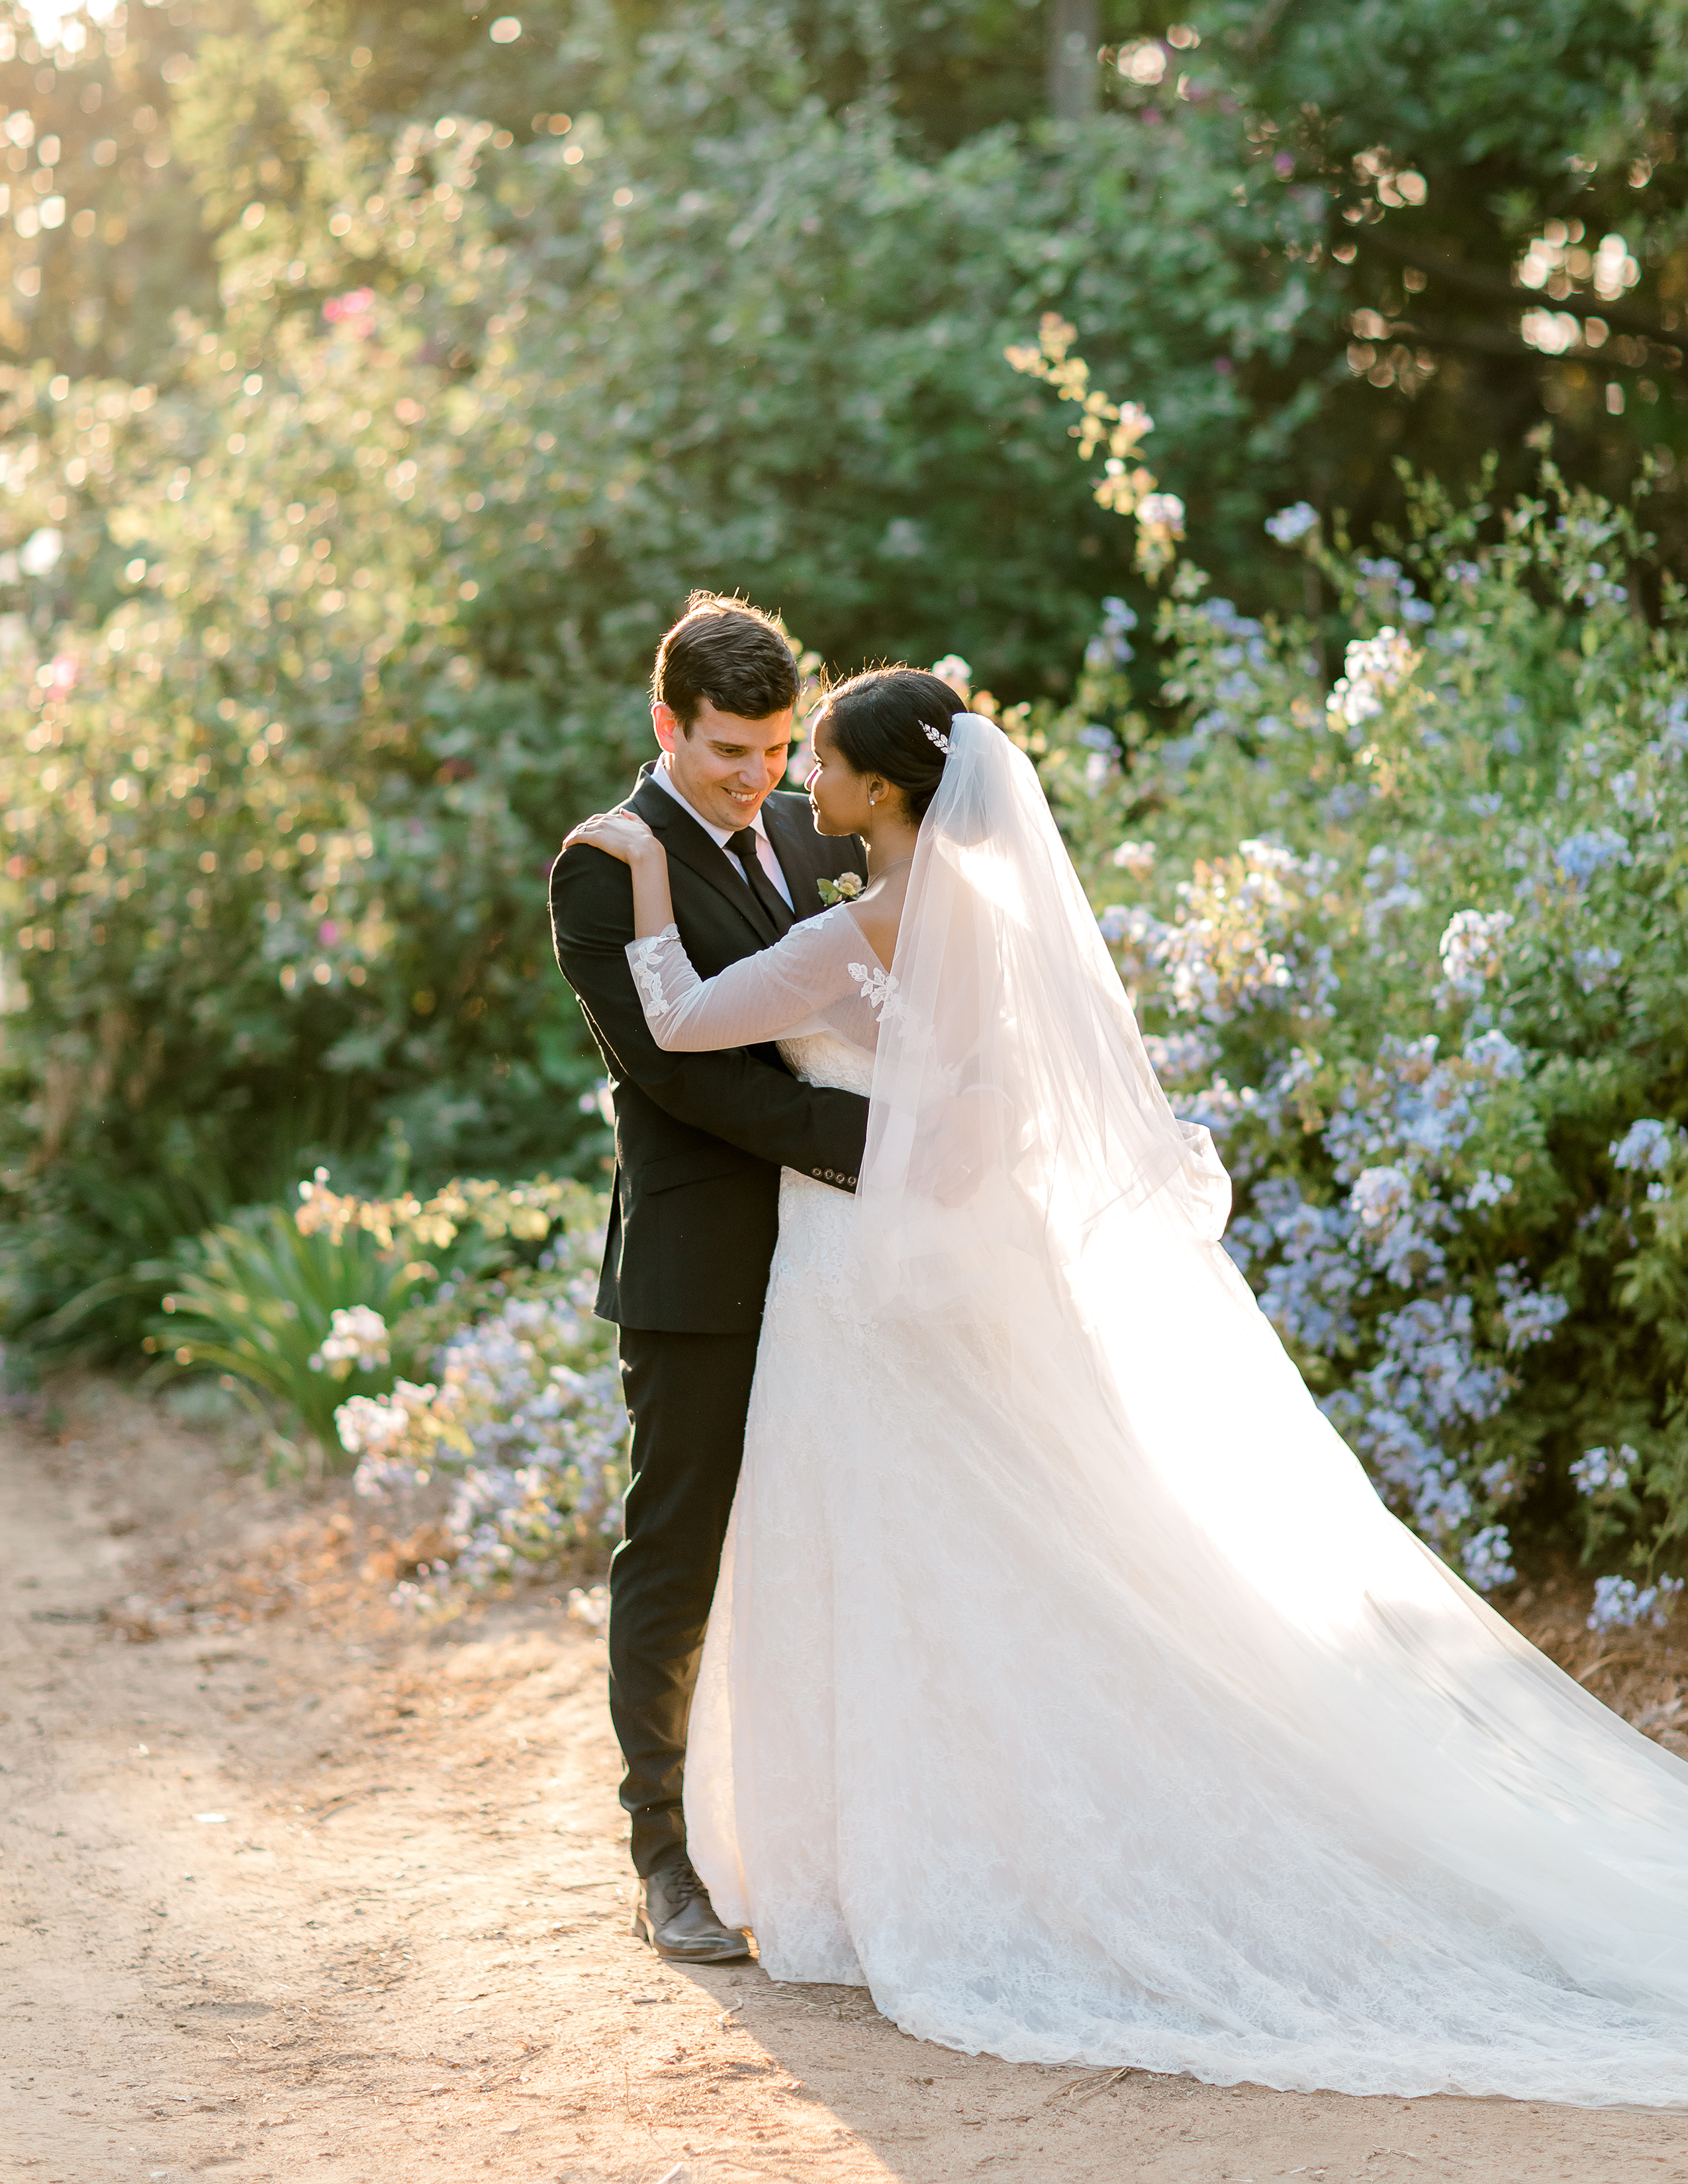 rorisang stephen wedding couple portraits